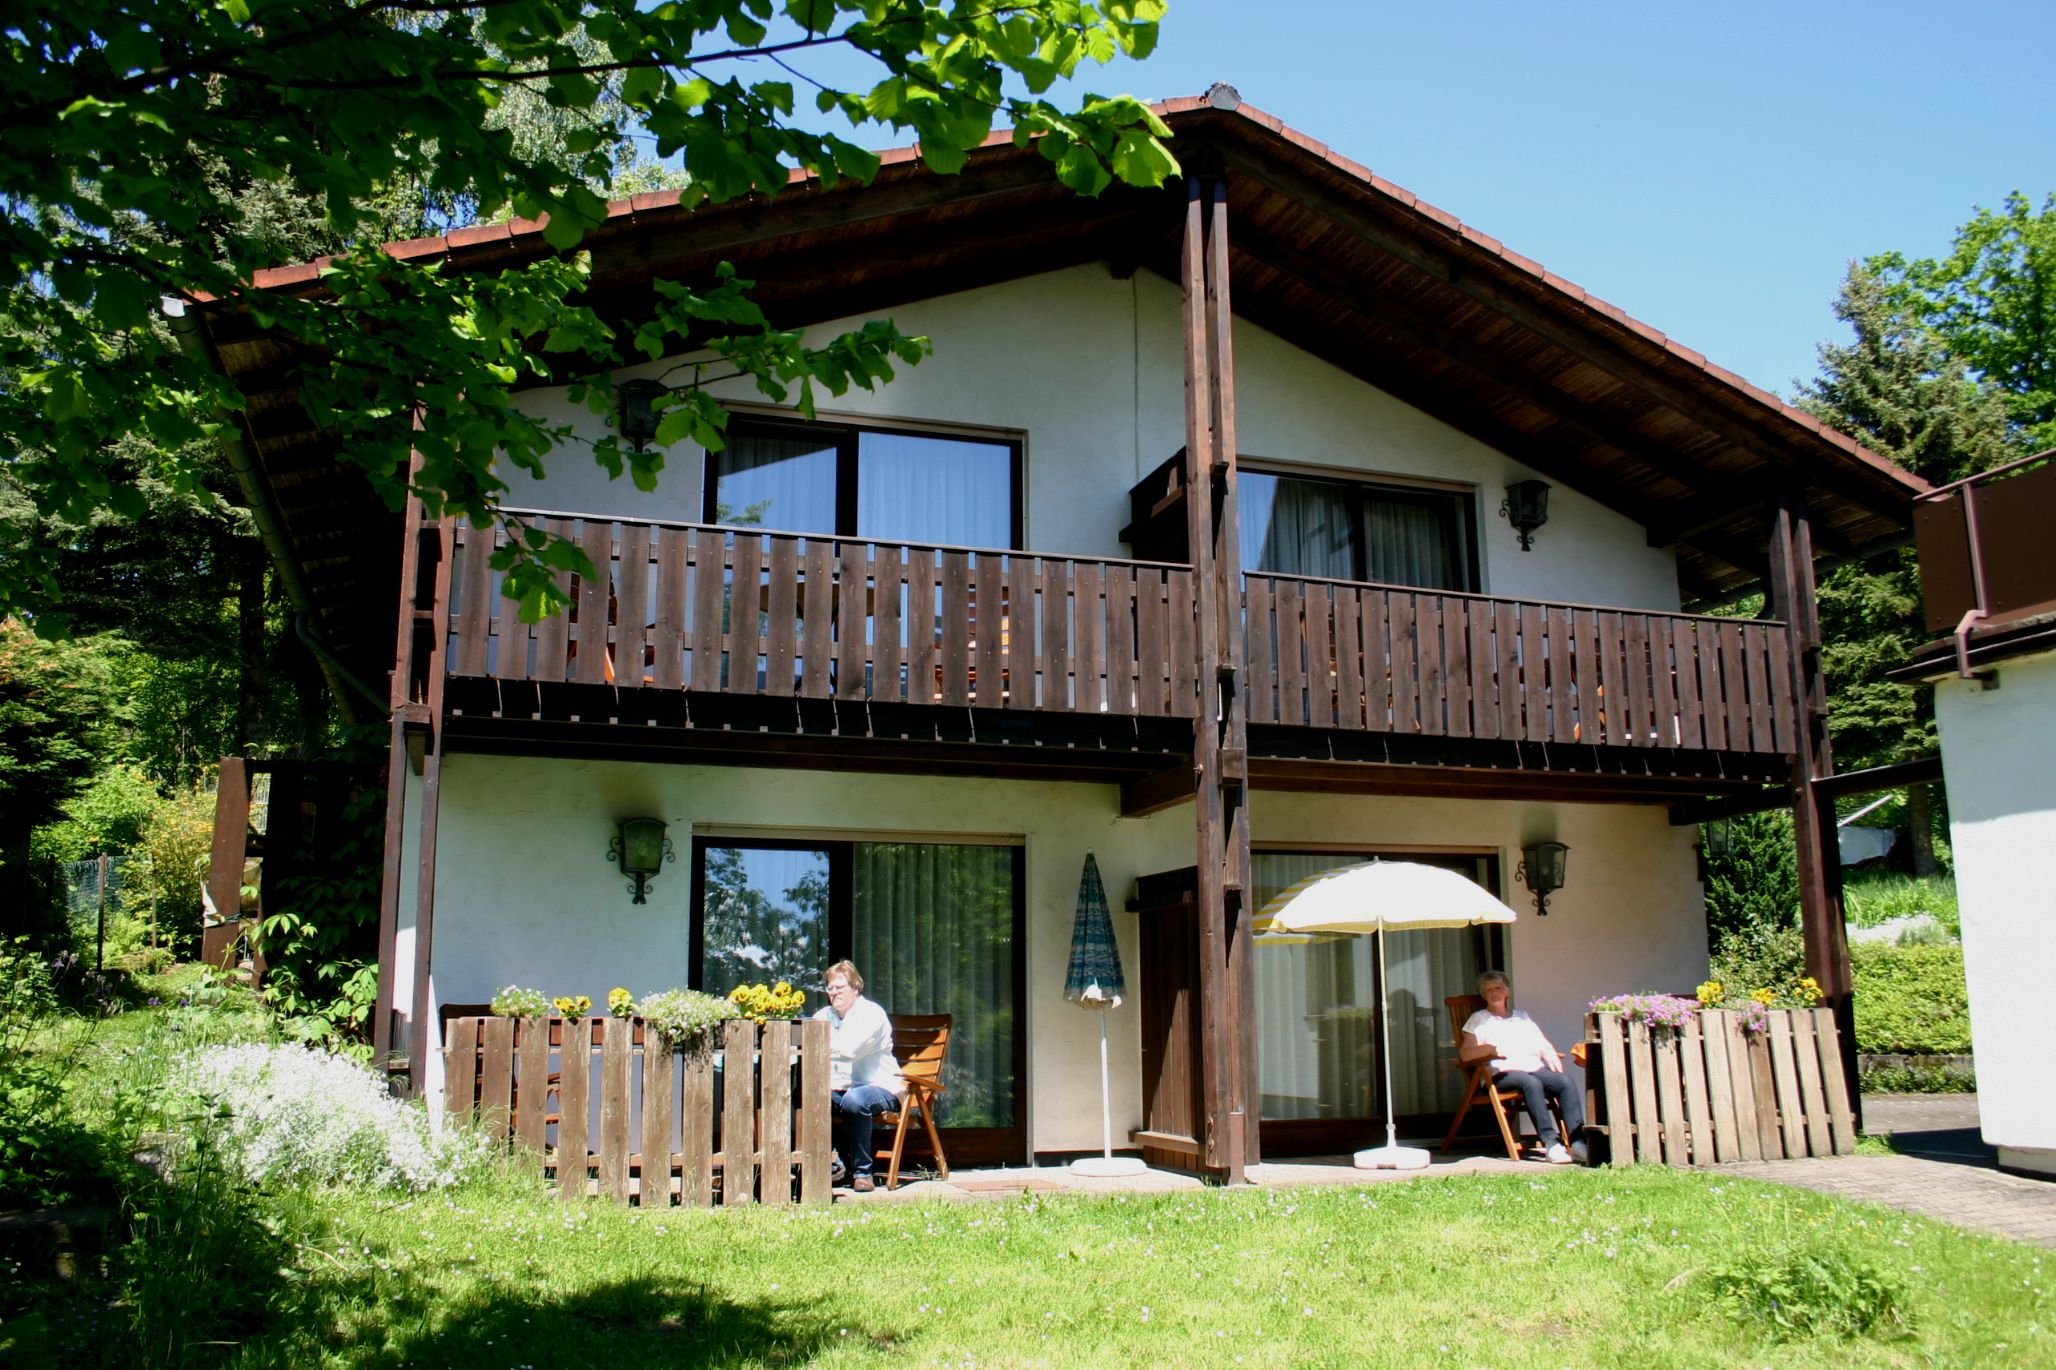 Haus Weserblick